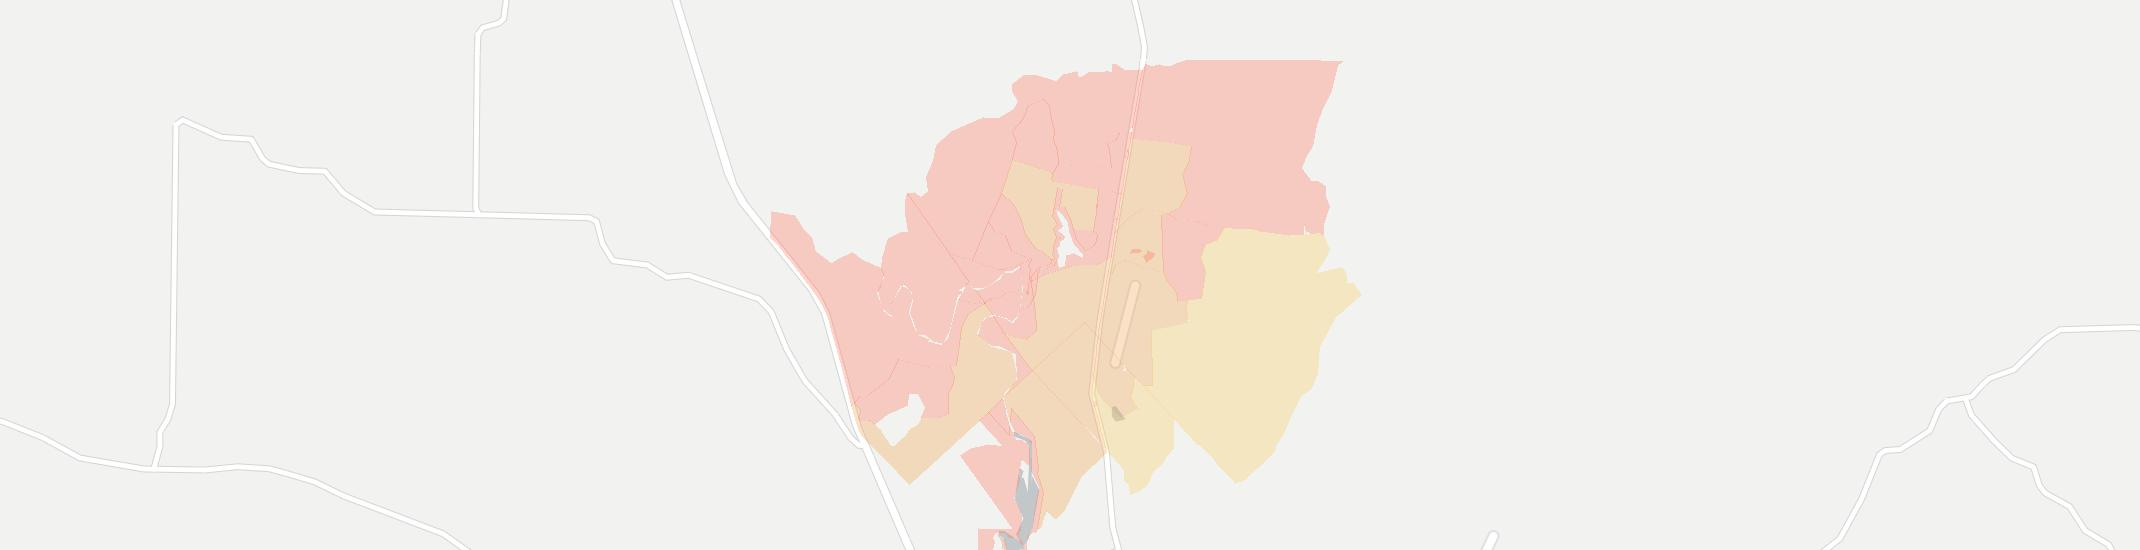 Mine La Motte Internet Competition Map. Click for interactive map.